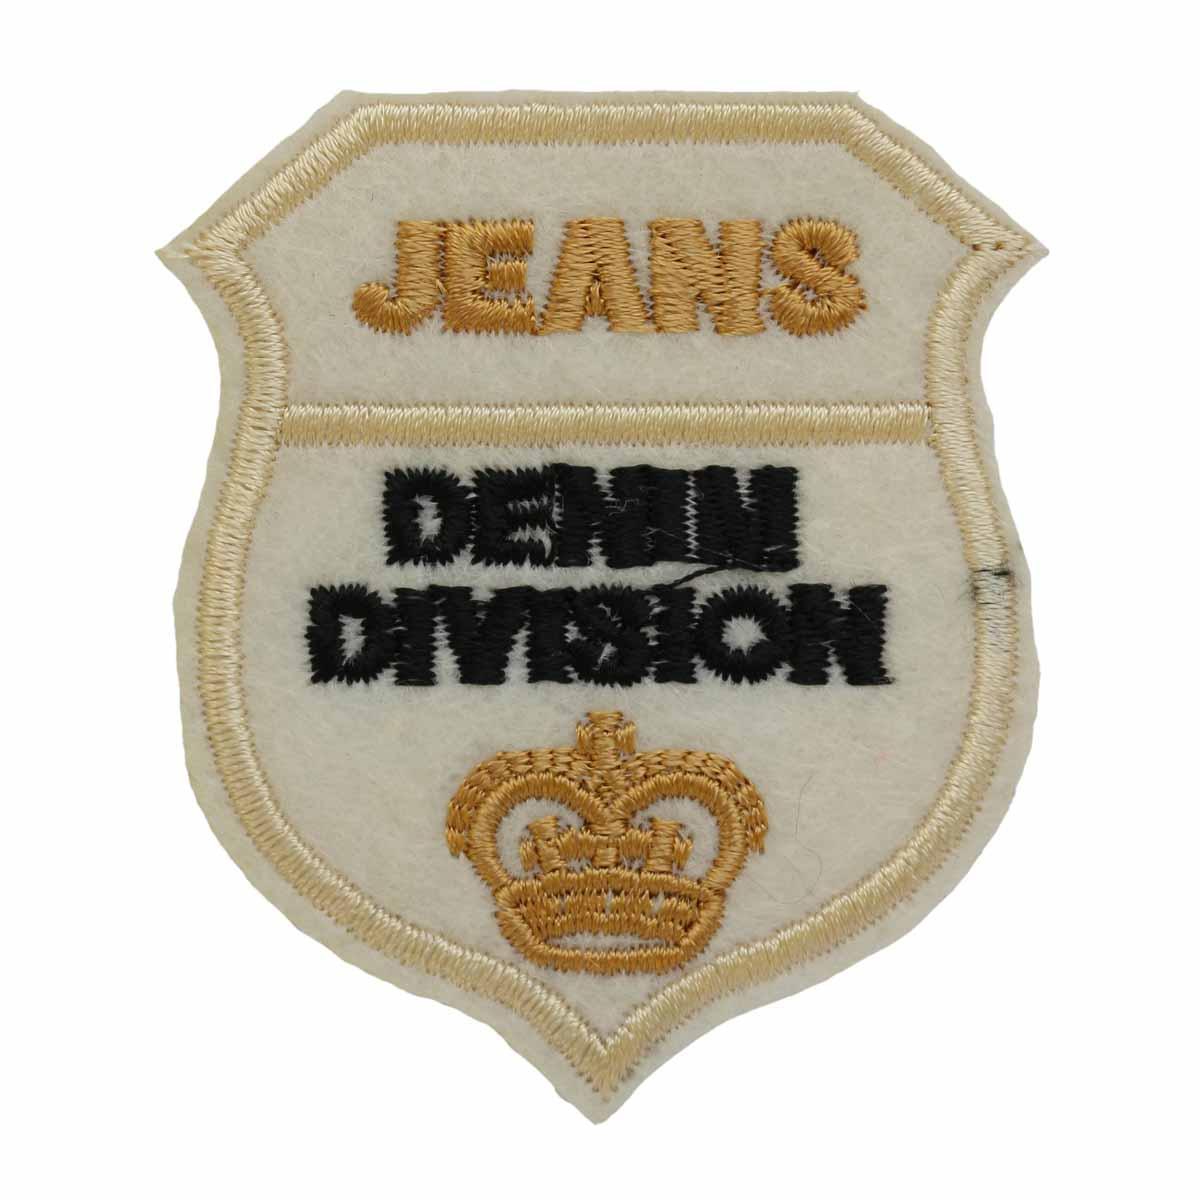 Термоаппликация LM-80360 'Jeans' 1шт Hobby&Pro basic